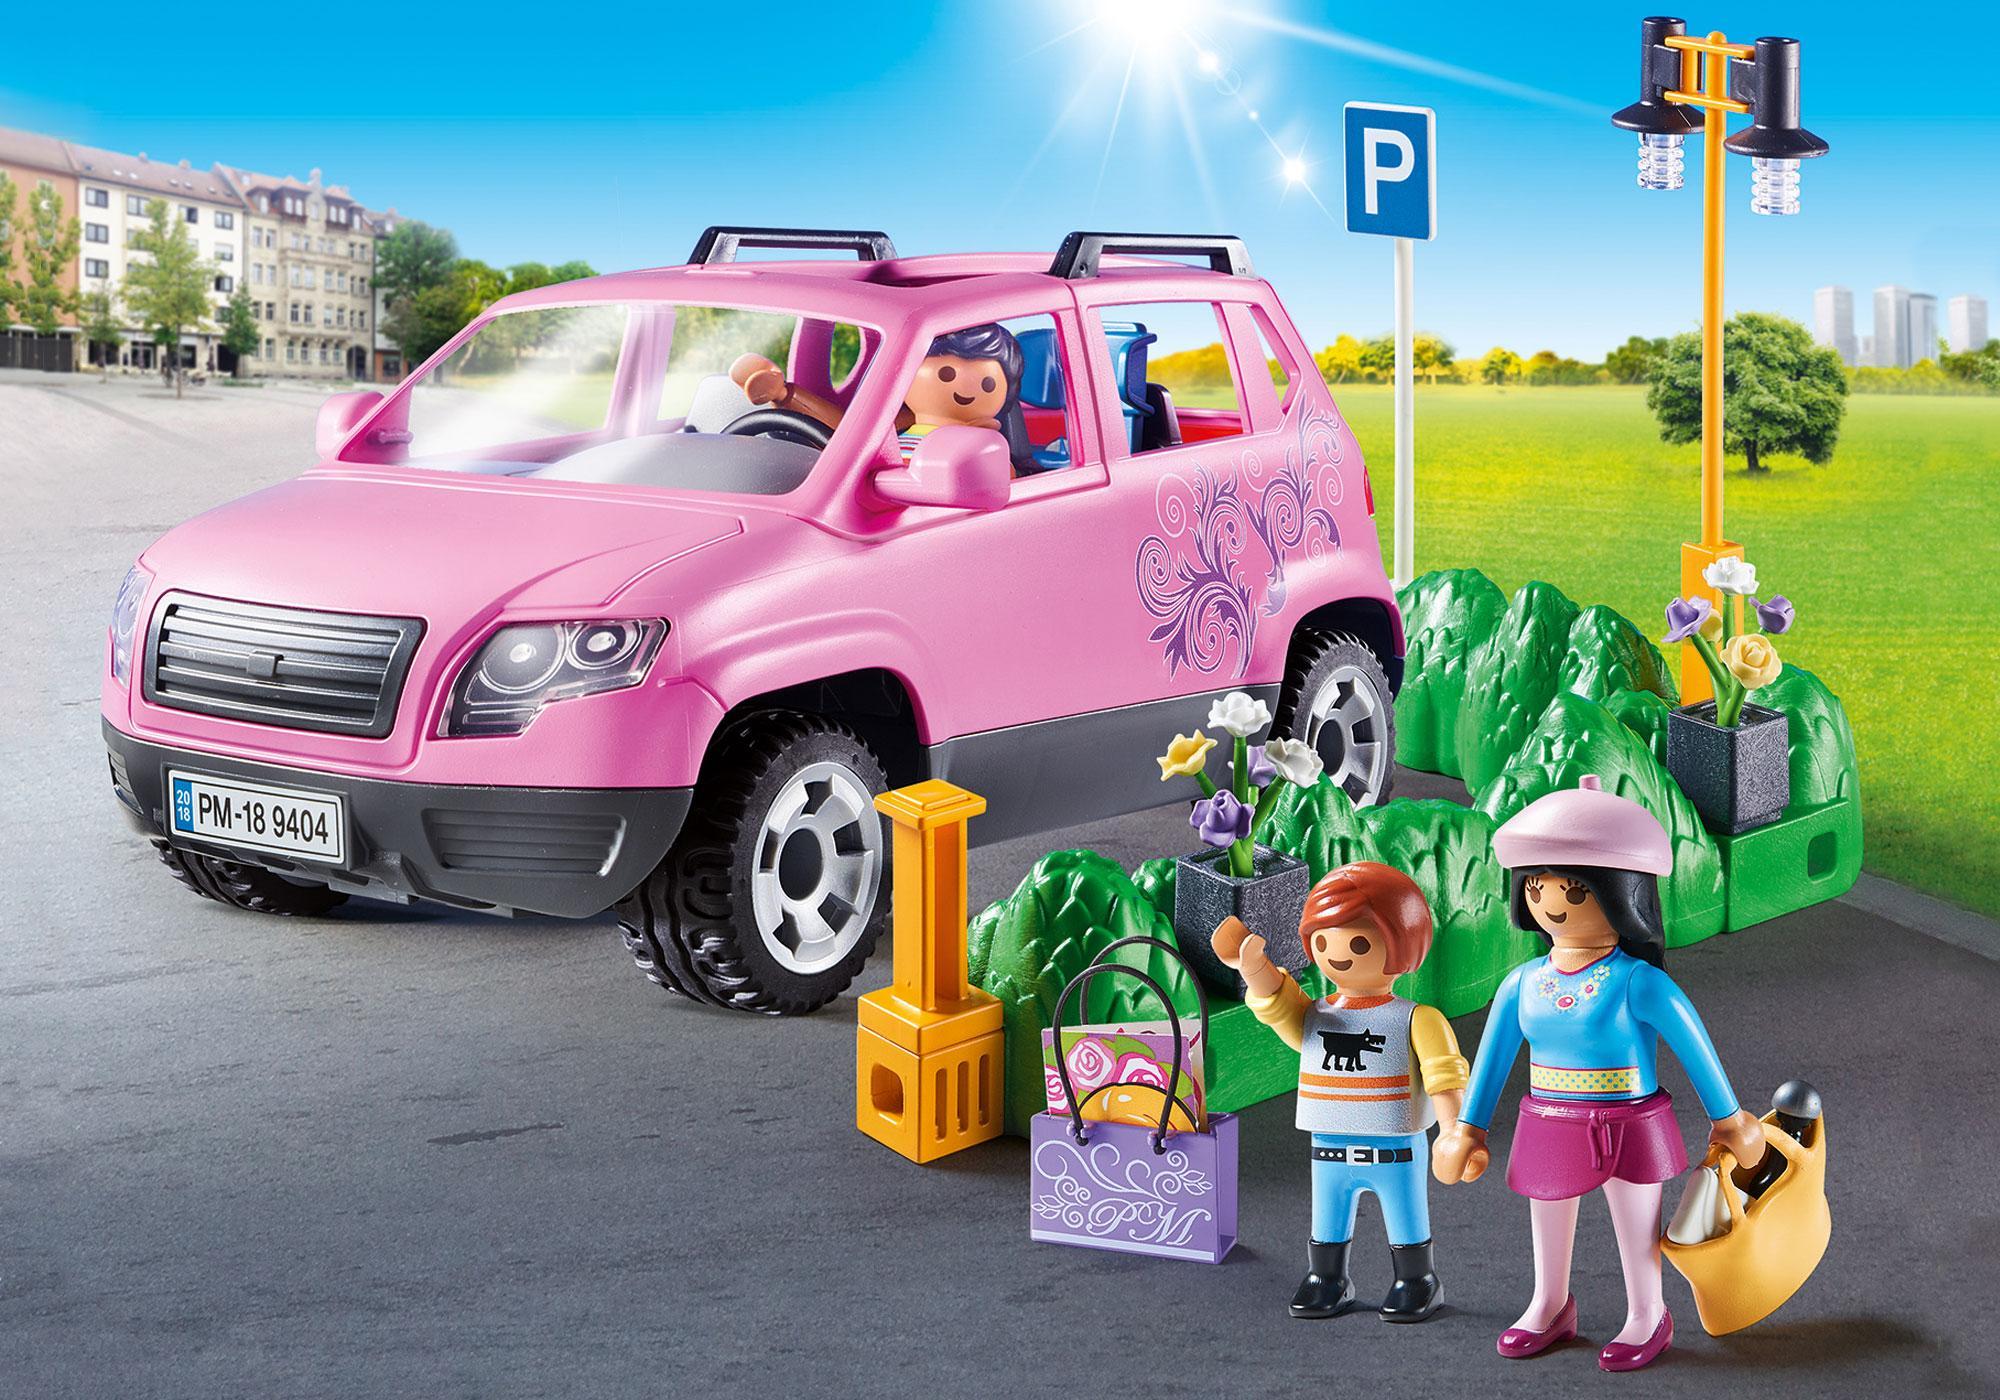 http://media.playmobil.com/i/playmobil/9404_product_detail/Familiewagen met parkeerplaats